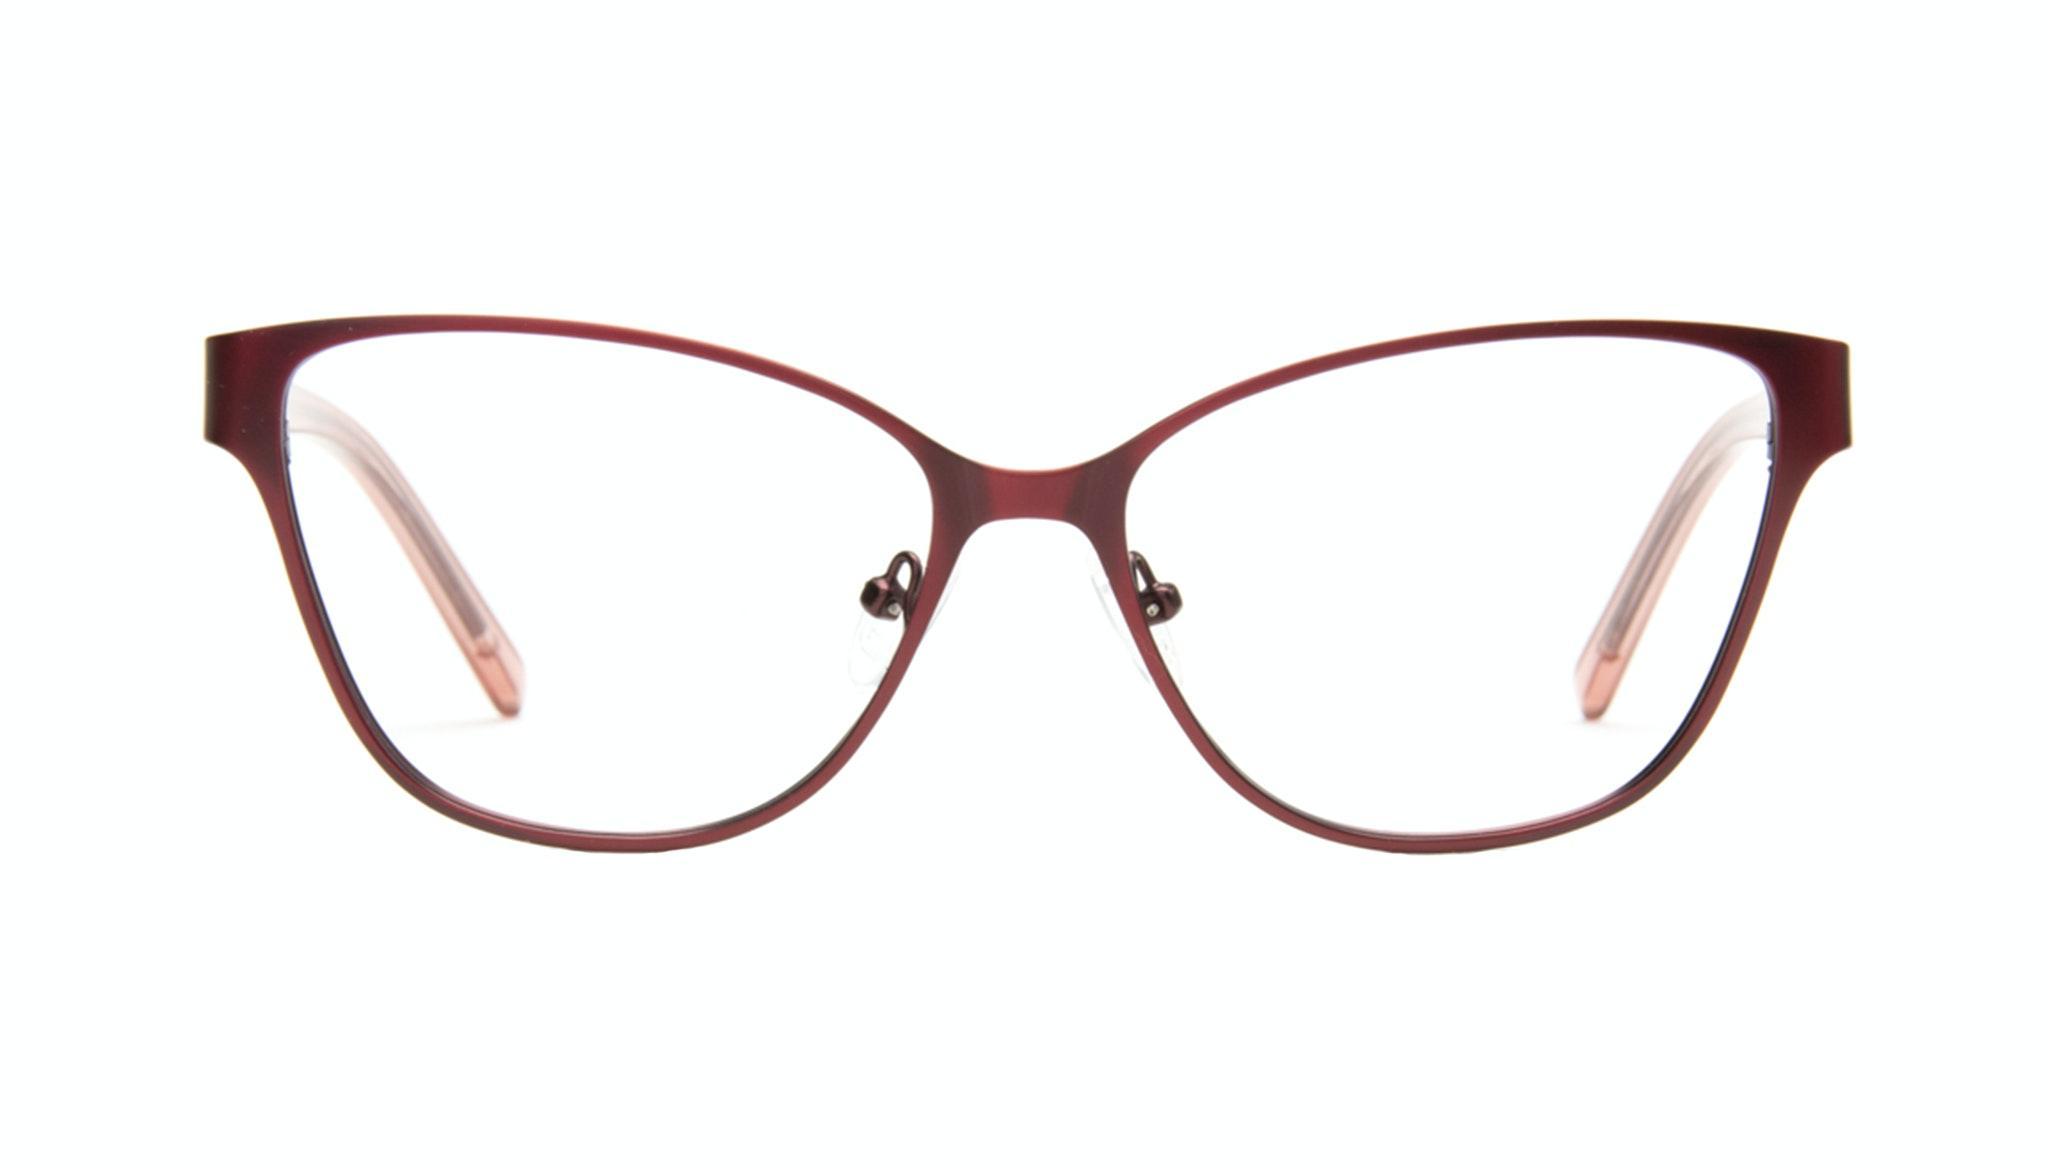 Affordable Fashion Glasses Rectangle Eyeglasses Women Radiant Cranberry Front